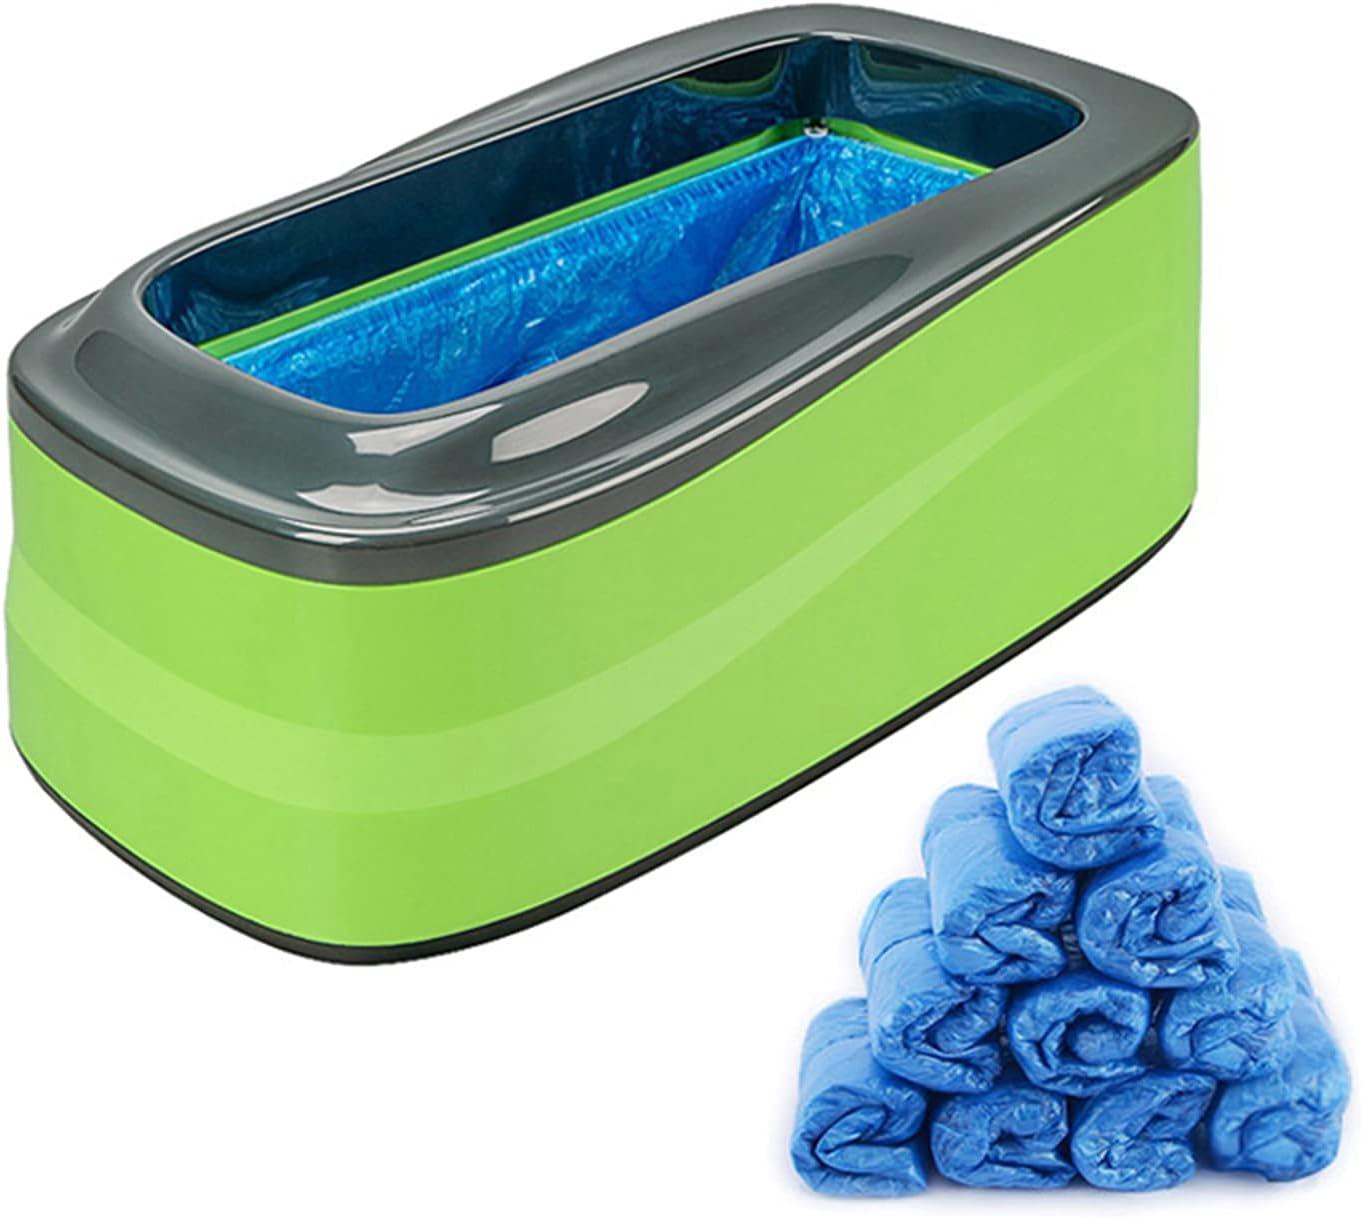 Magnetic Max 54% OFF Lid Design Shoe Au Dispenser Machine Purchase Cover